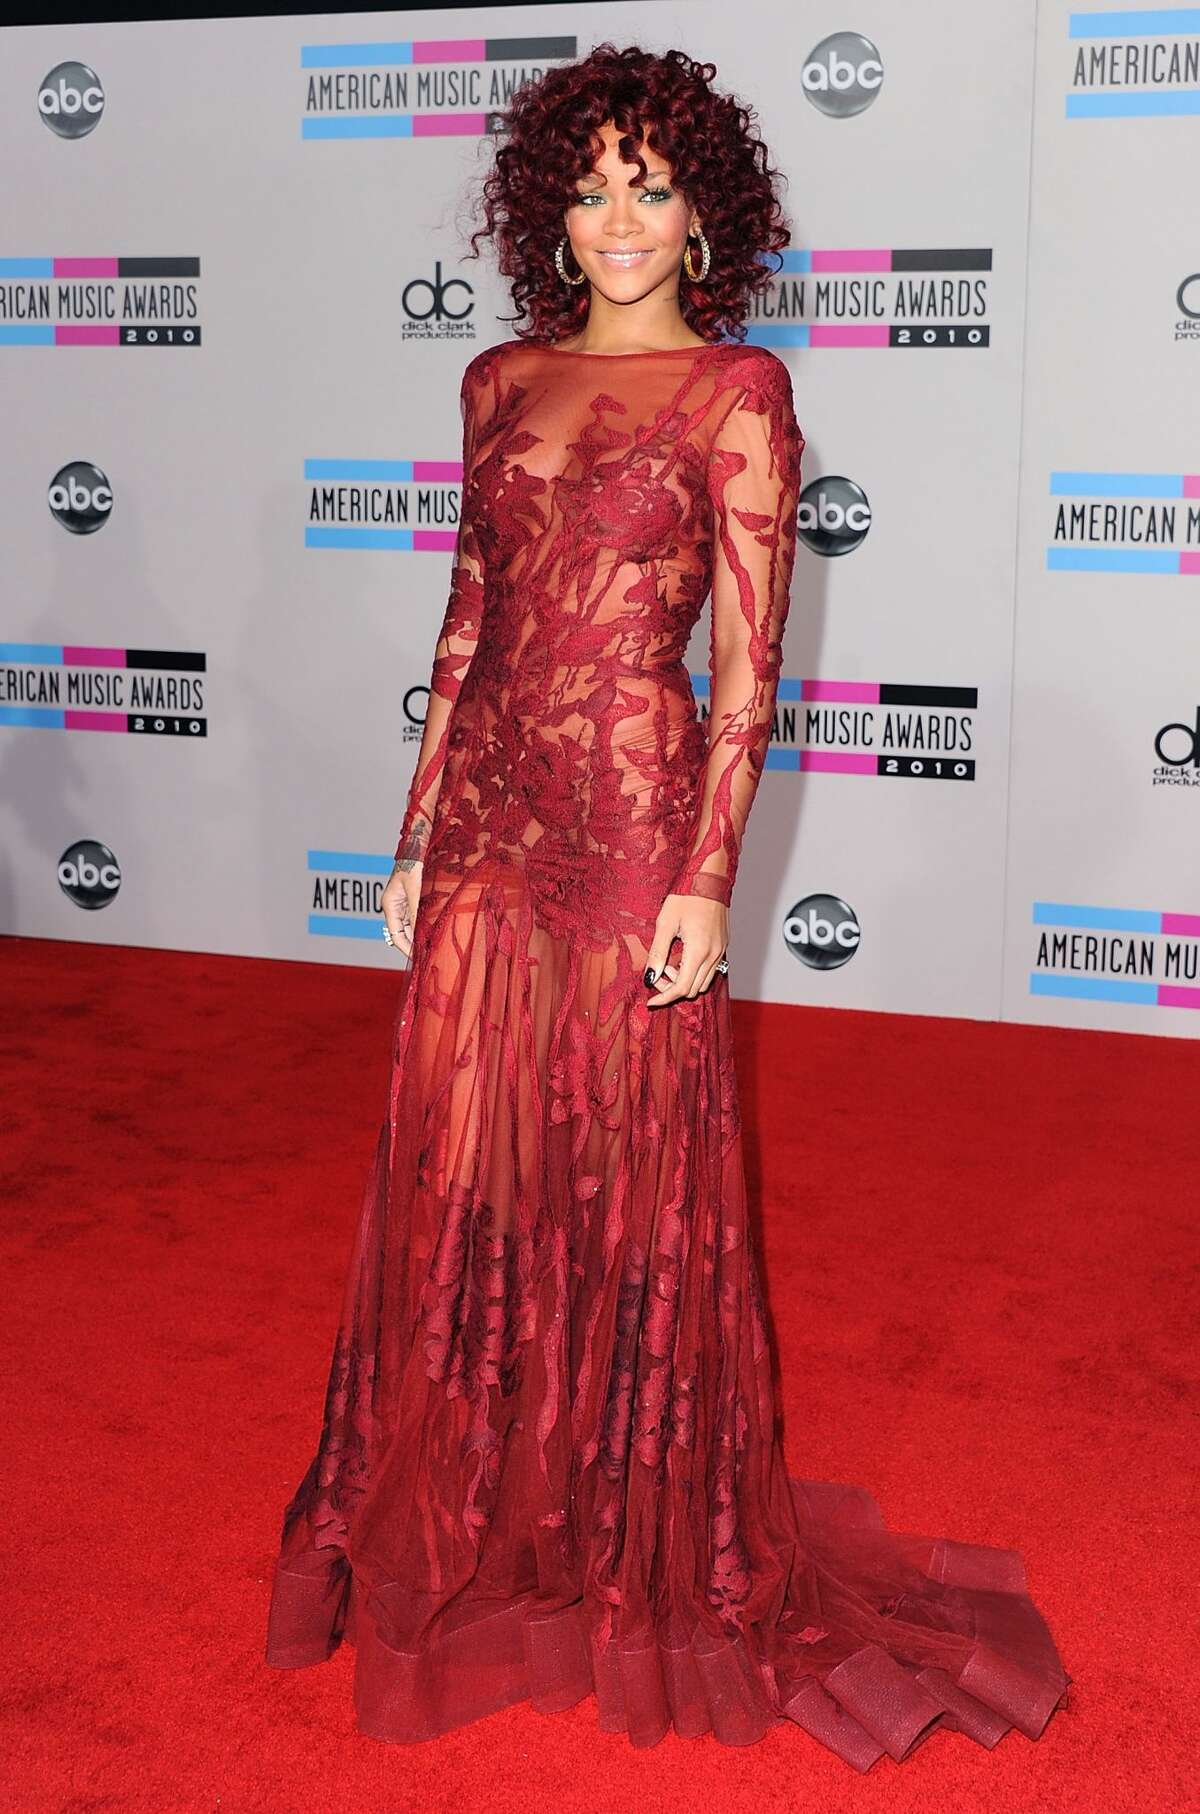 LOS ANGELES, CA - NOVEMBER 21: Singer Rihanna arrives at the 2010 American Music Awards held at Nokia Theatre L.A. Live on November 21, 2010 in Los Angeles, California. (Photo by Jon Kopaloff/FilmMagic)